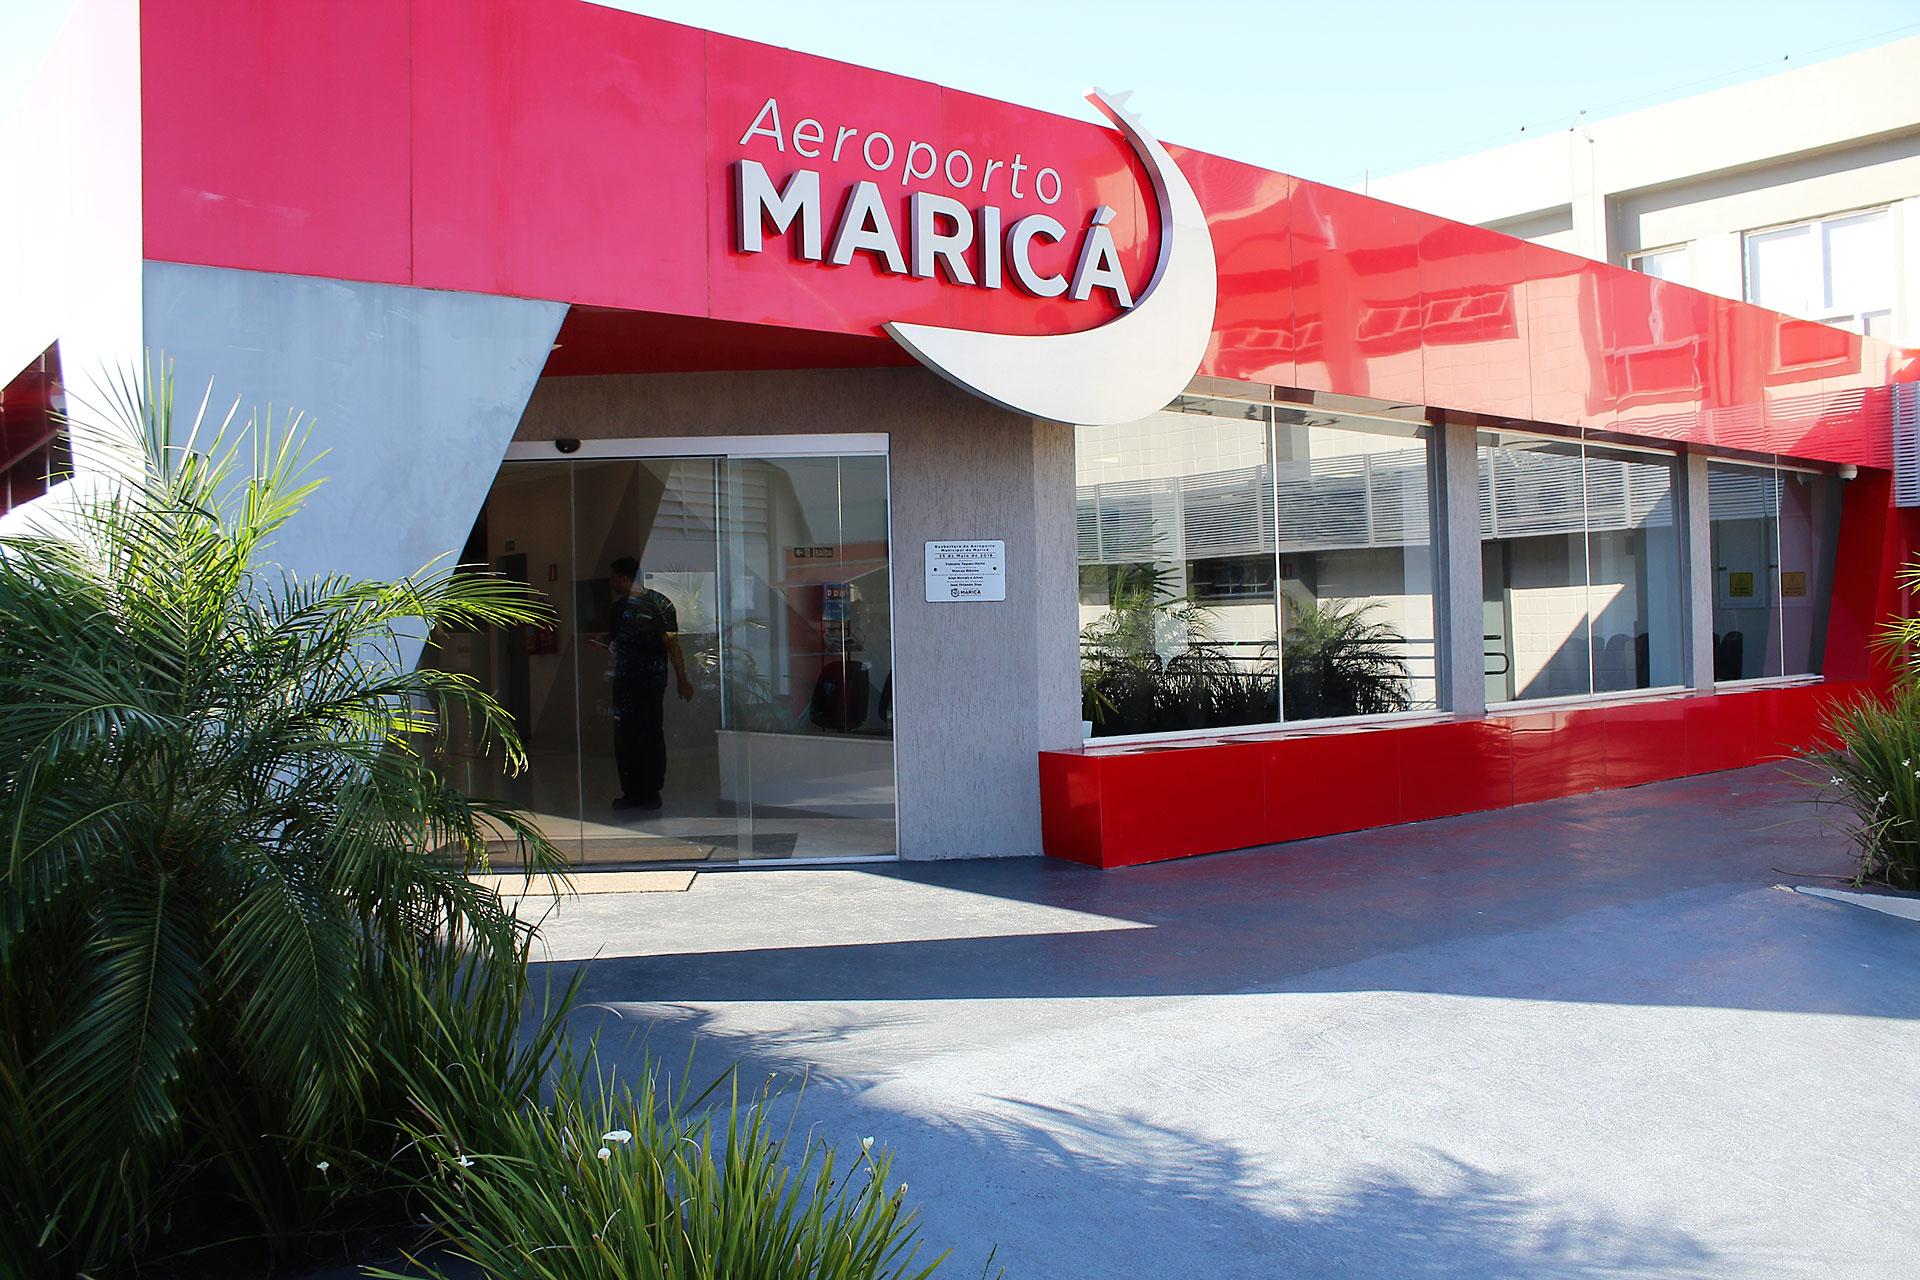 Aeroporto Maricá